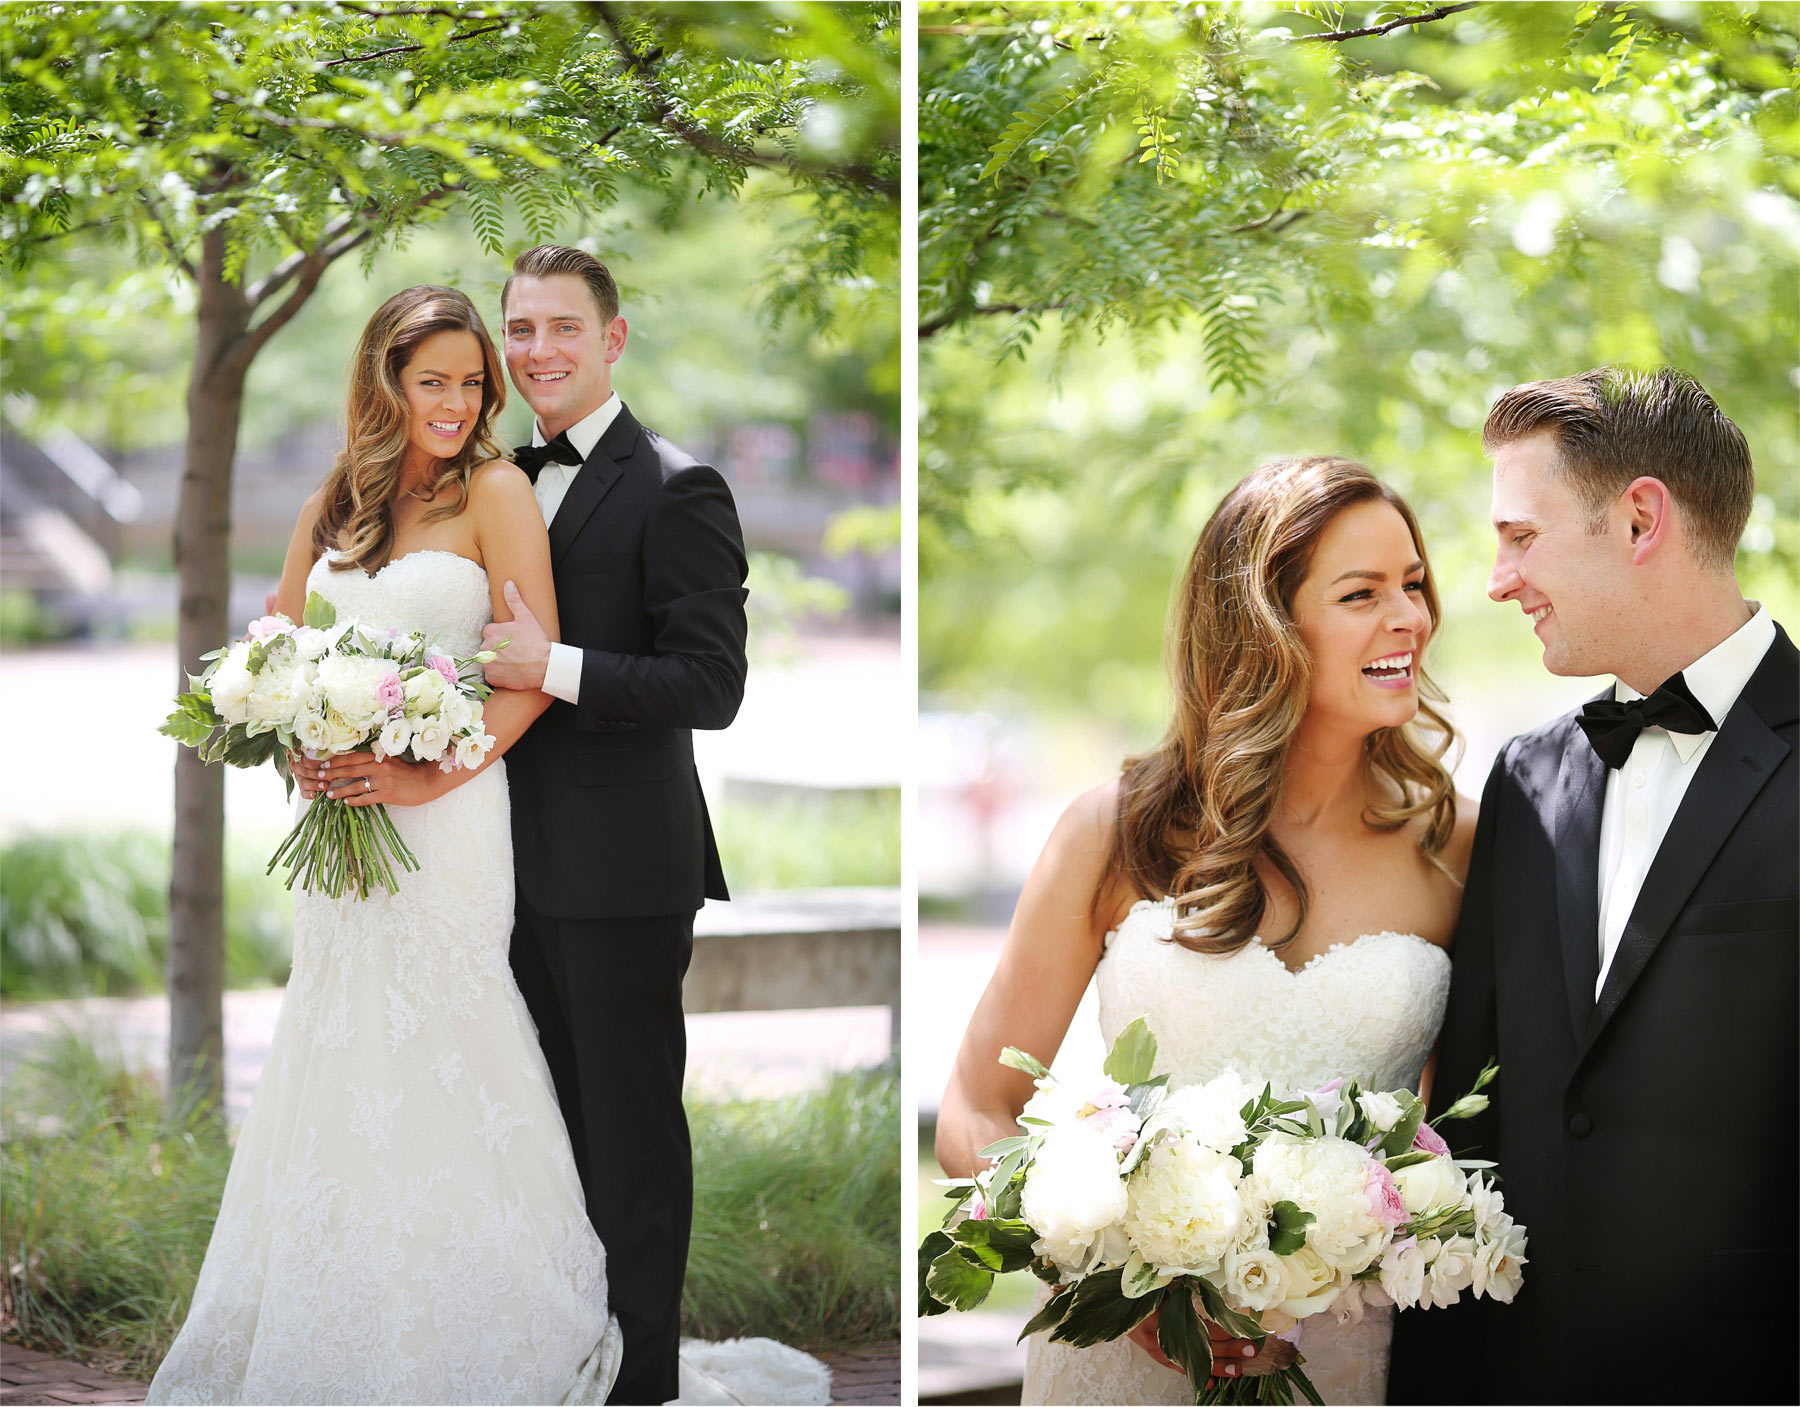 09-Saint-Paul-Minnesota-Wedding-Photographer-by-Andrew-Vick-Photography-Summer-Abulae-First-Meeting-Bride-Groom-Flowers-Dress-Embrace-Molly-and-Dan.jpg